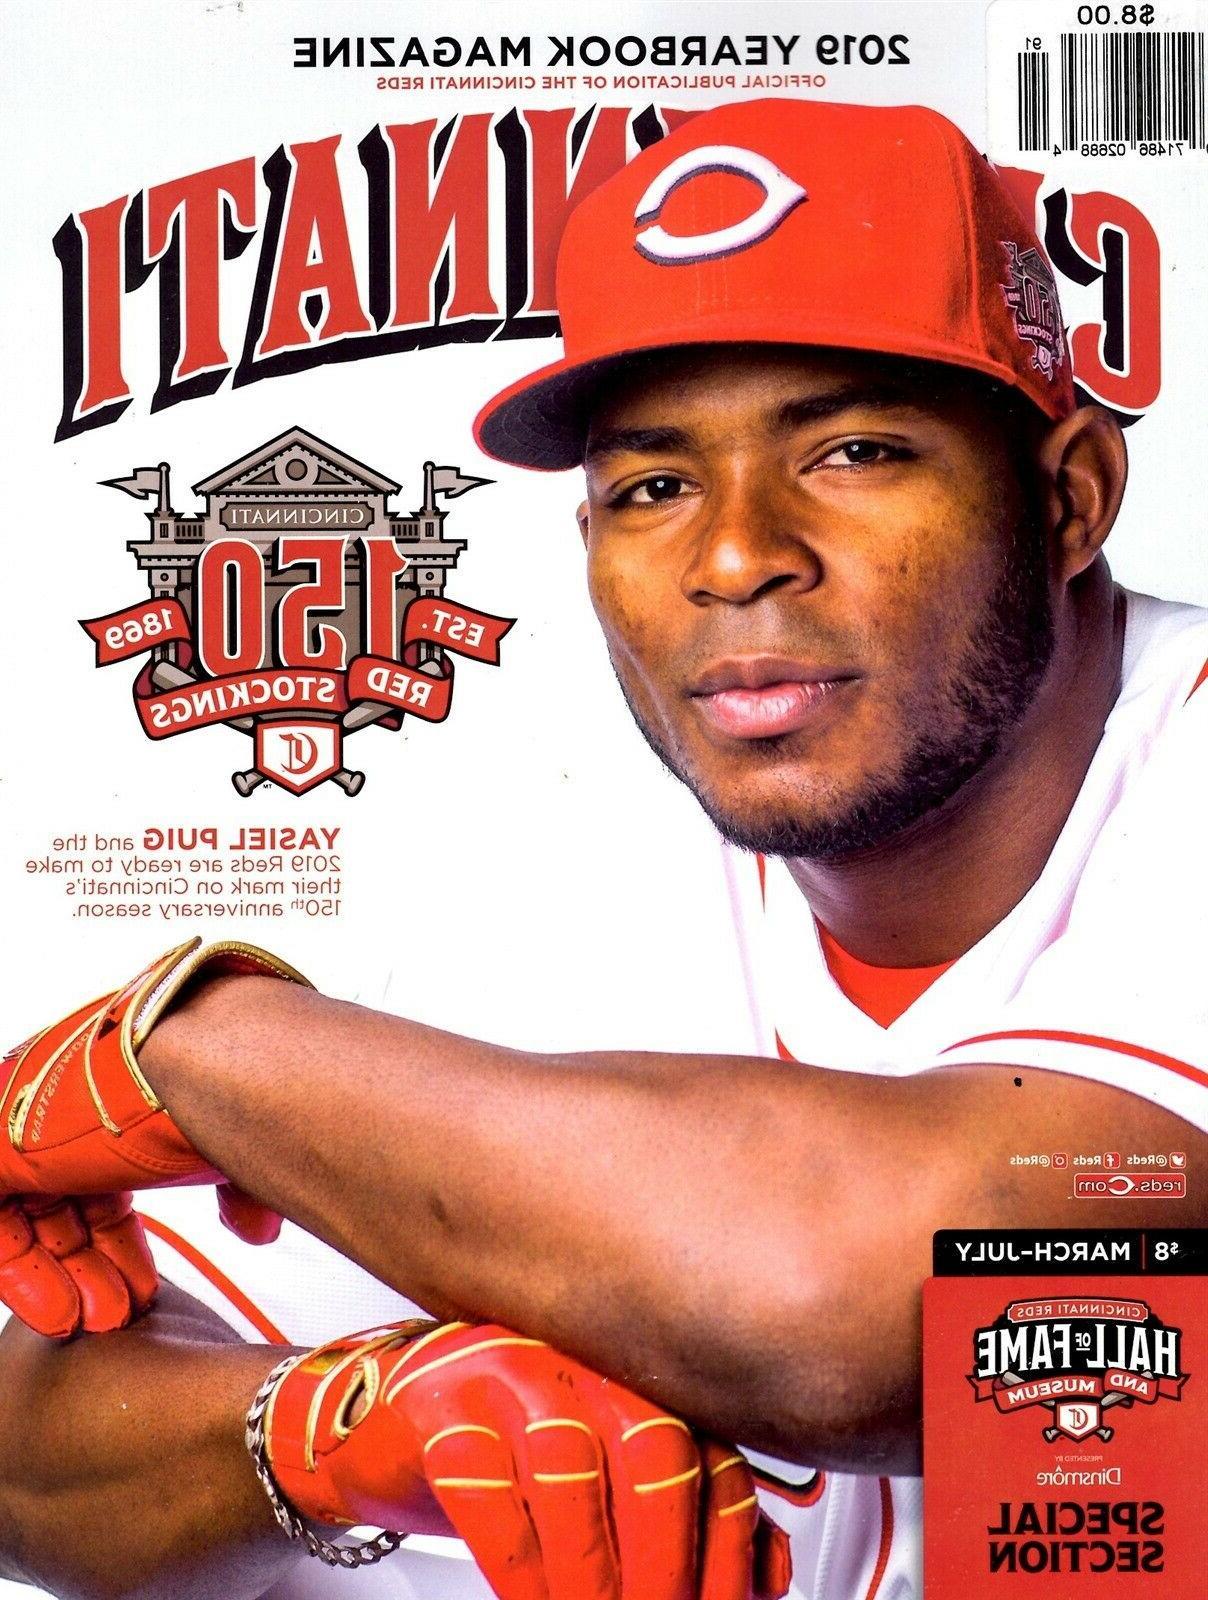 yearbook 2019 mlb baseball cincinnati reds